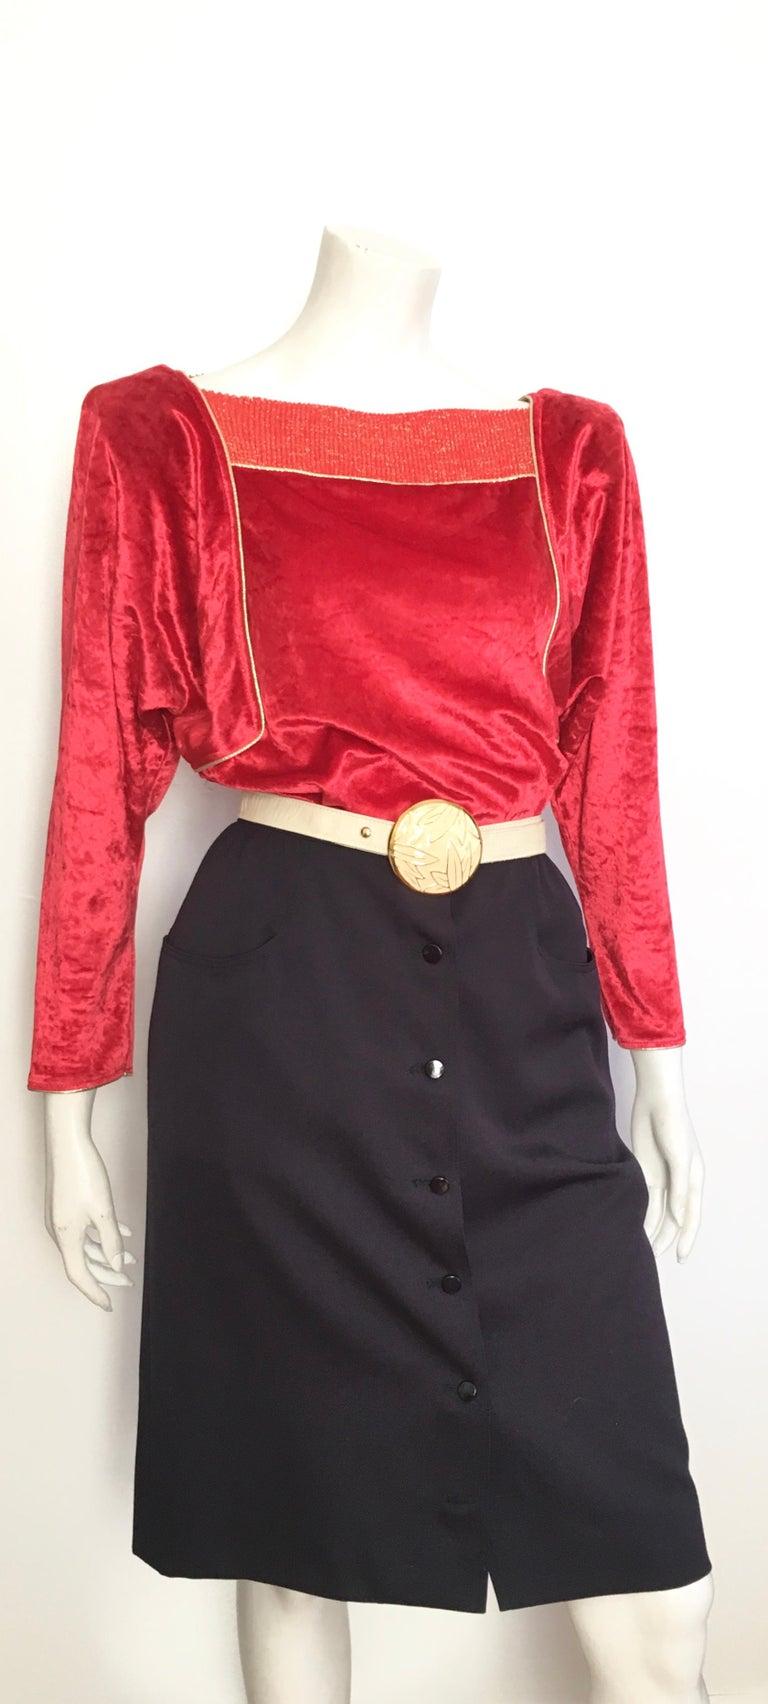 Oscar de la Renta for Swirl 1980s Red Velvet & Metallic Trim Blouse Size P. For Sale 10